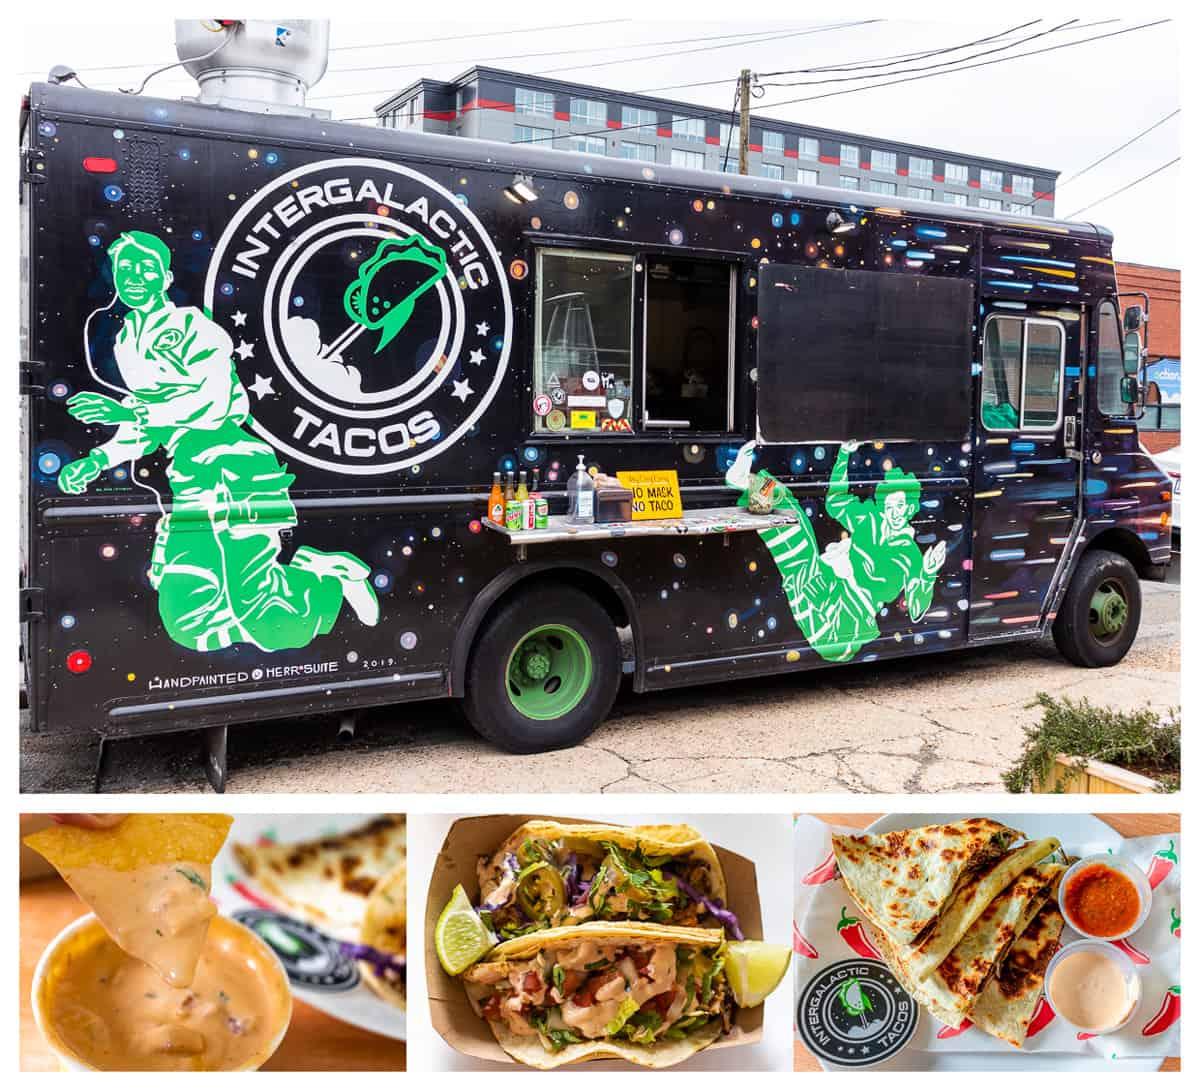 Intergalactic Taco truck and food items